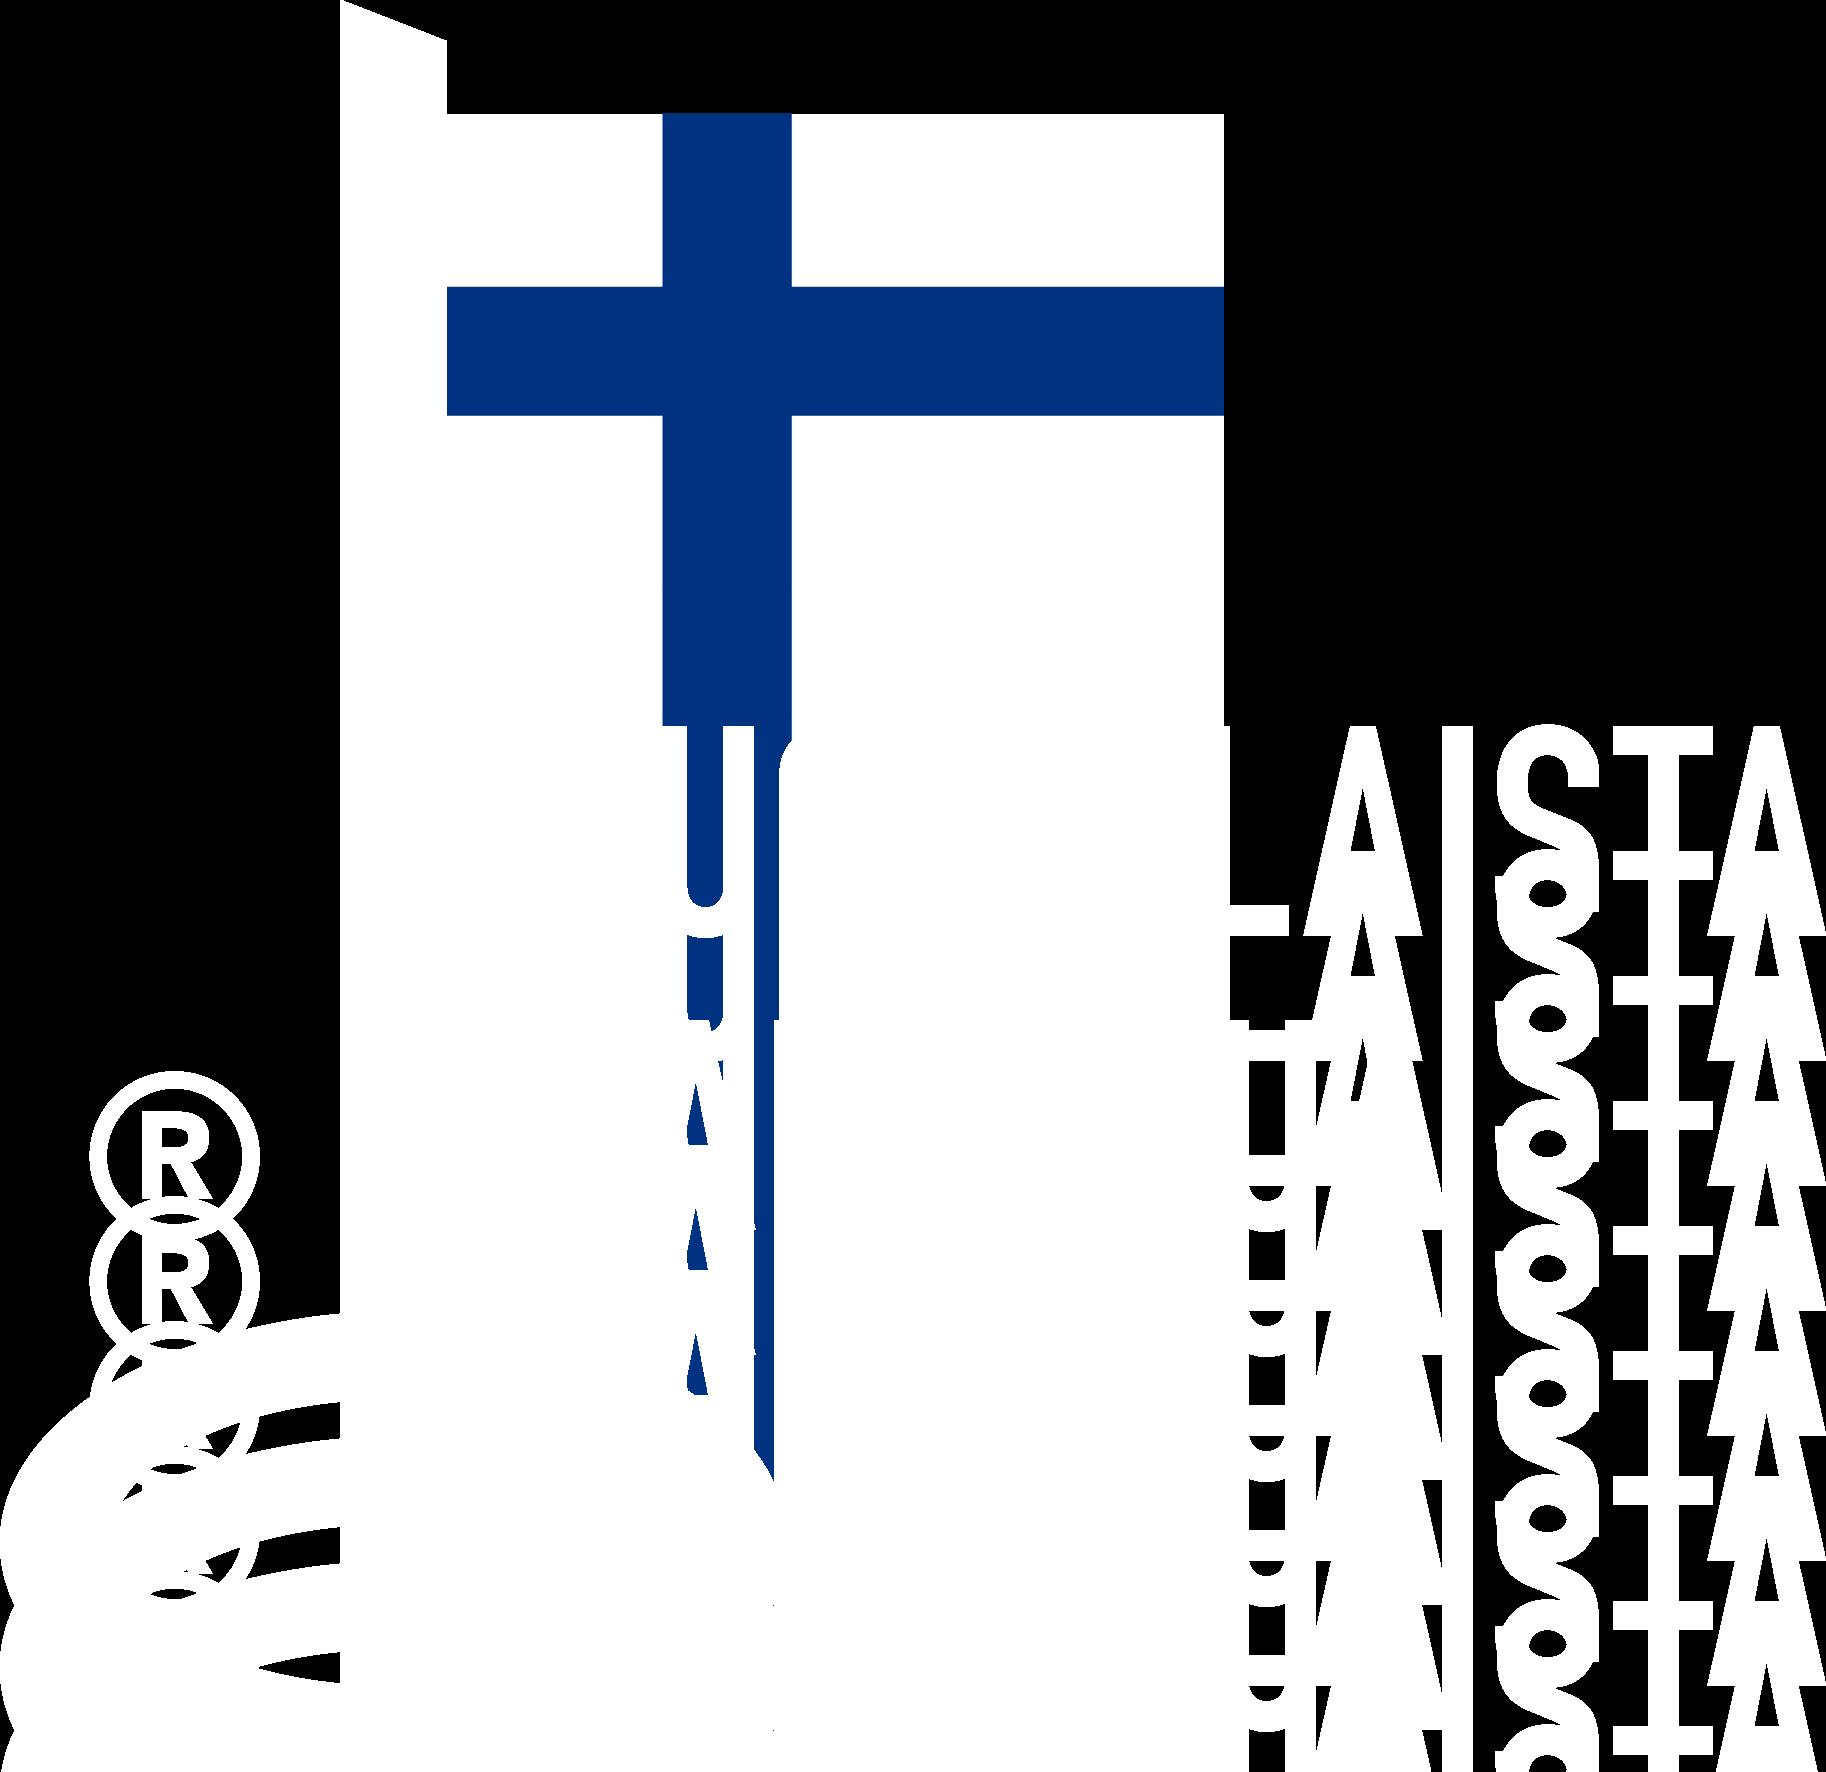 Suomalaista Palvelua logo